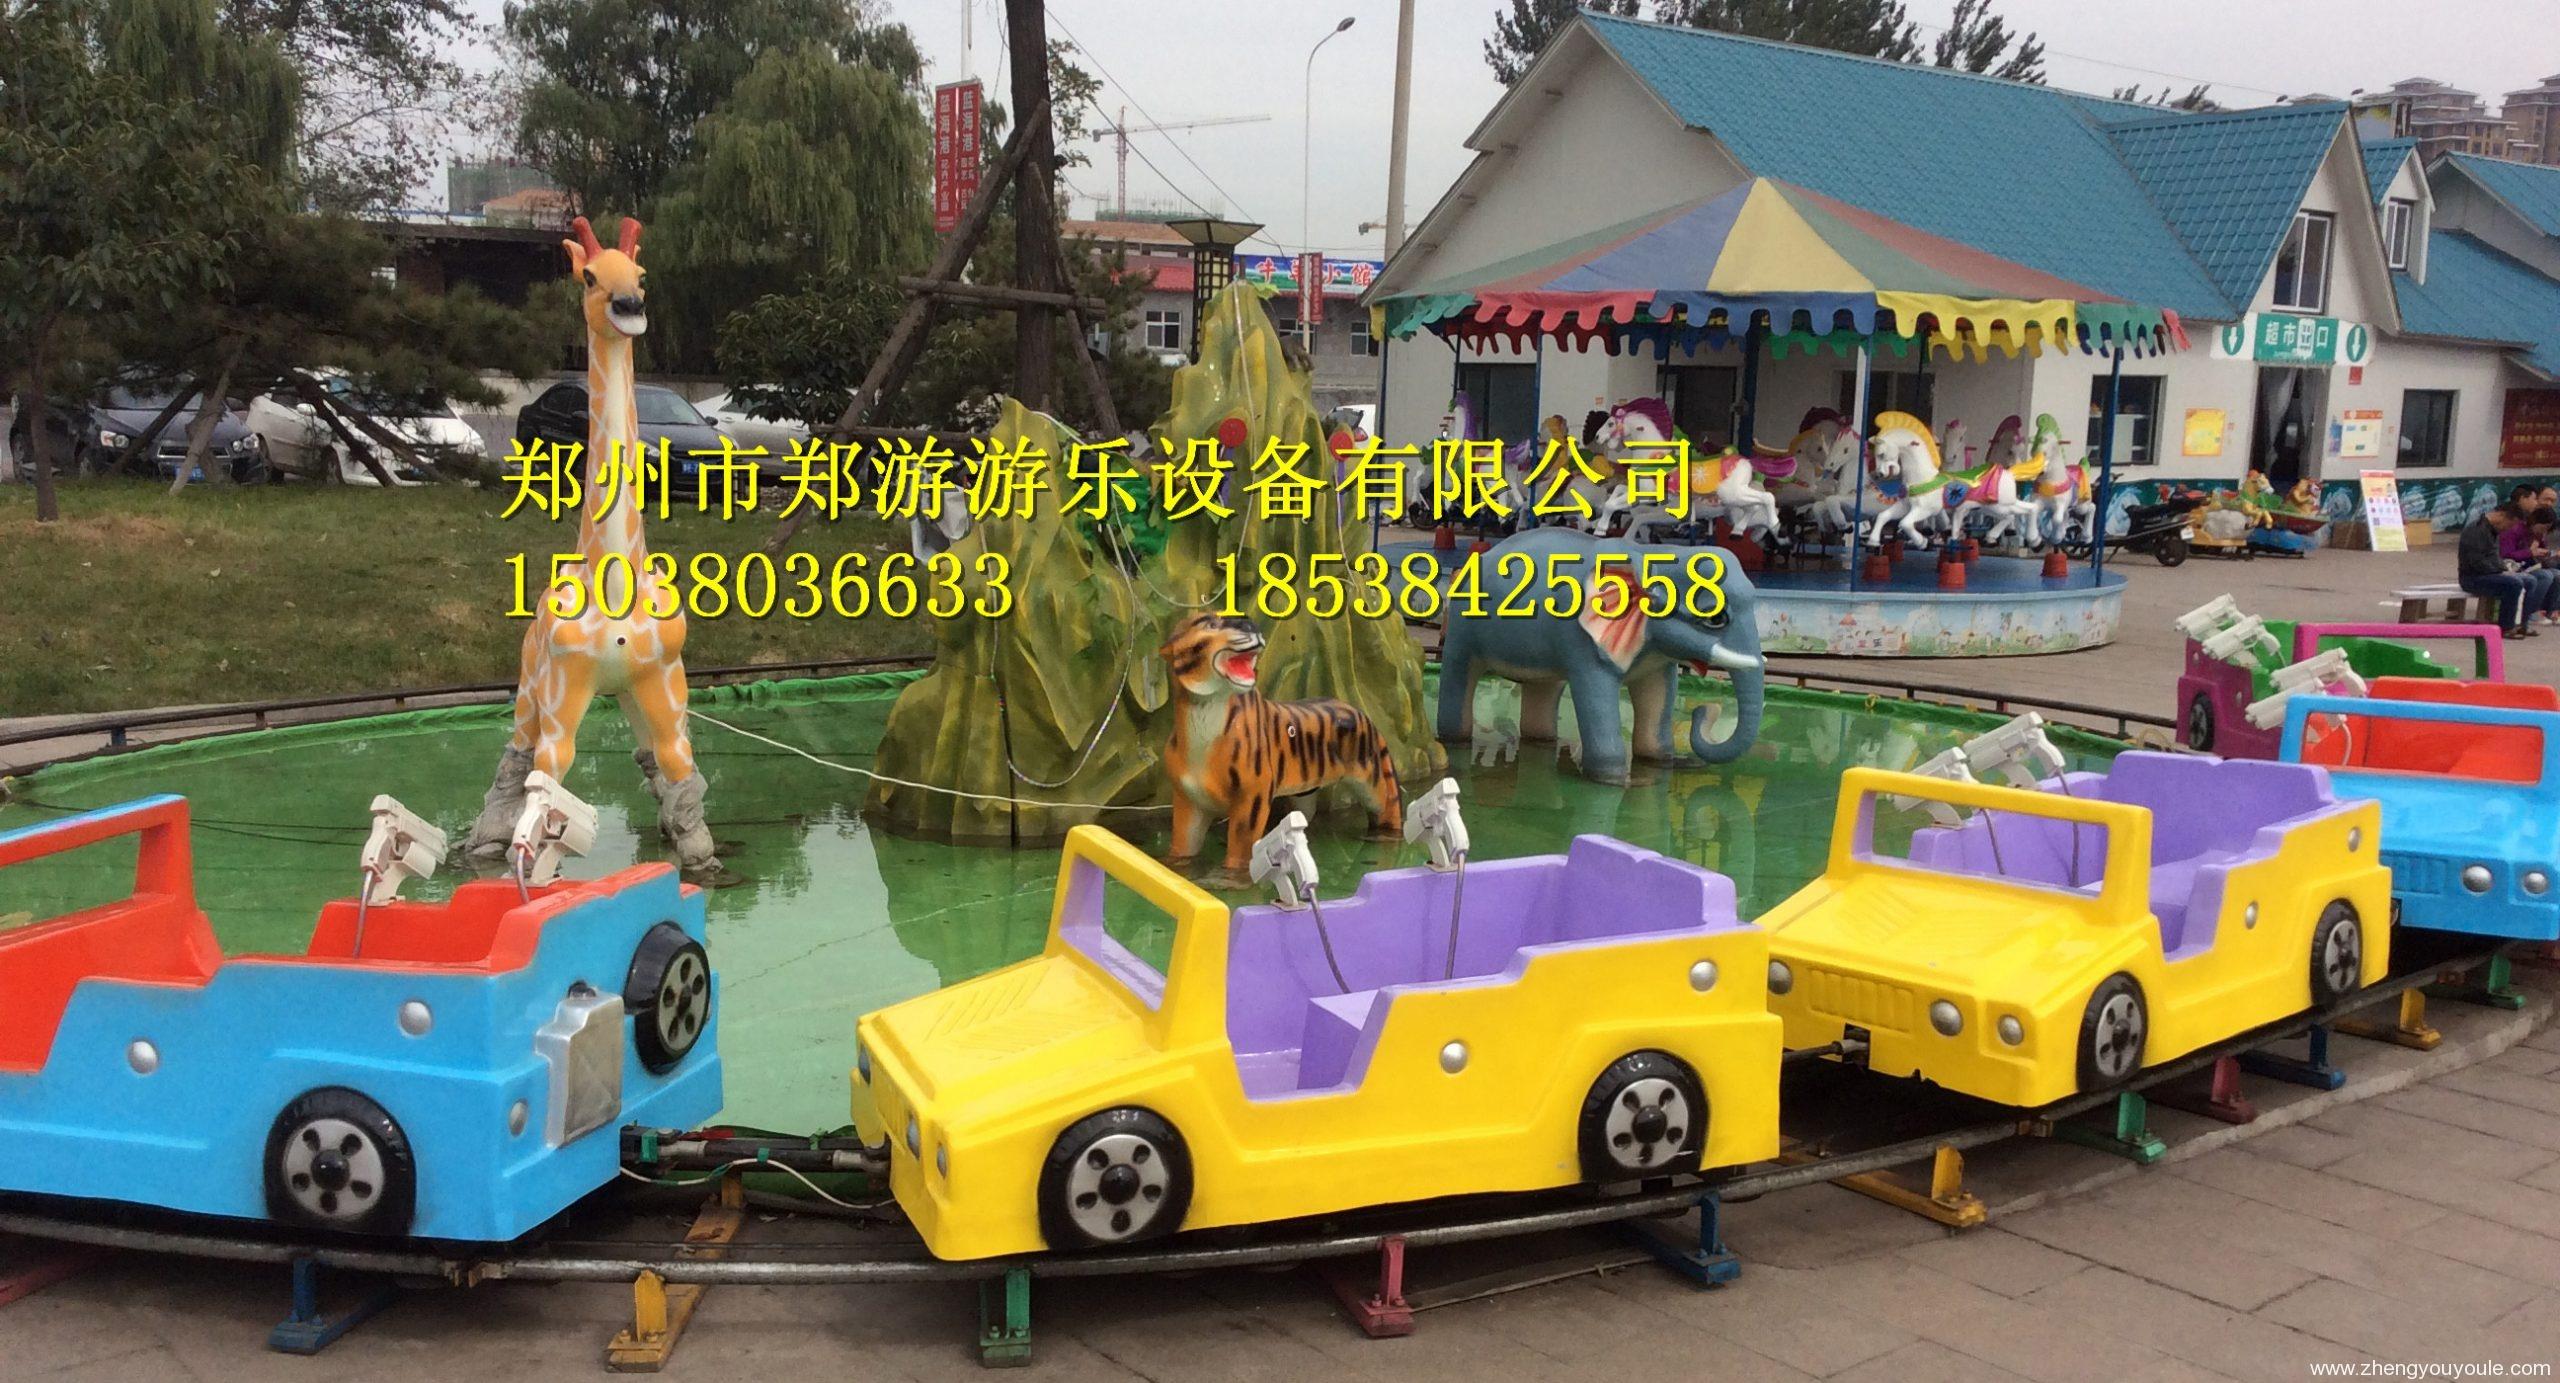 2020030710233065 scaled - 轨道类—水陆战车